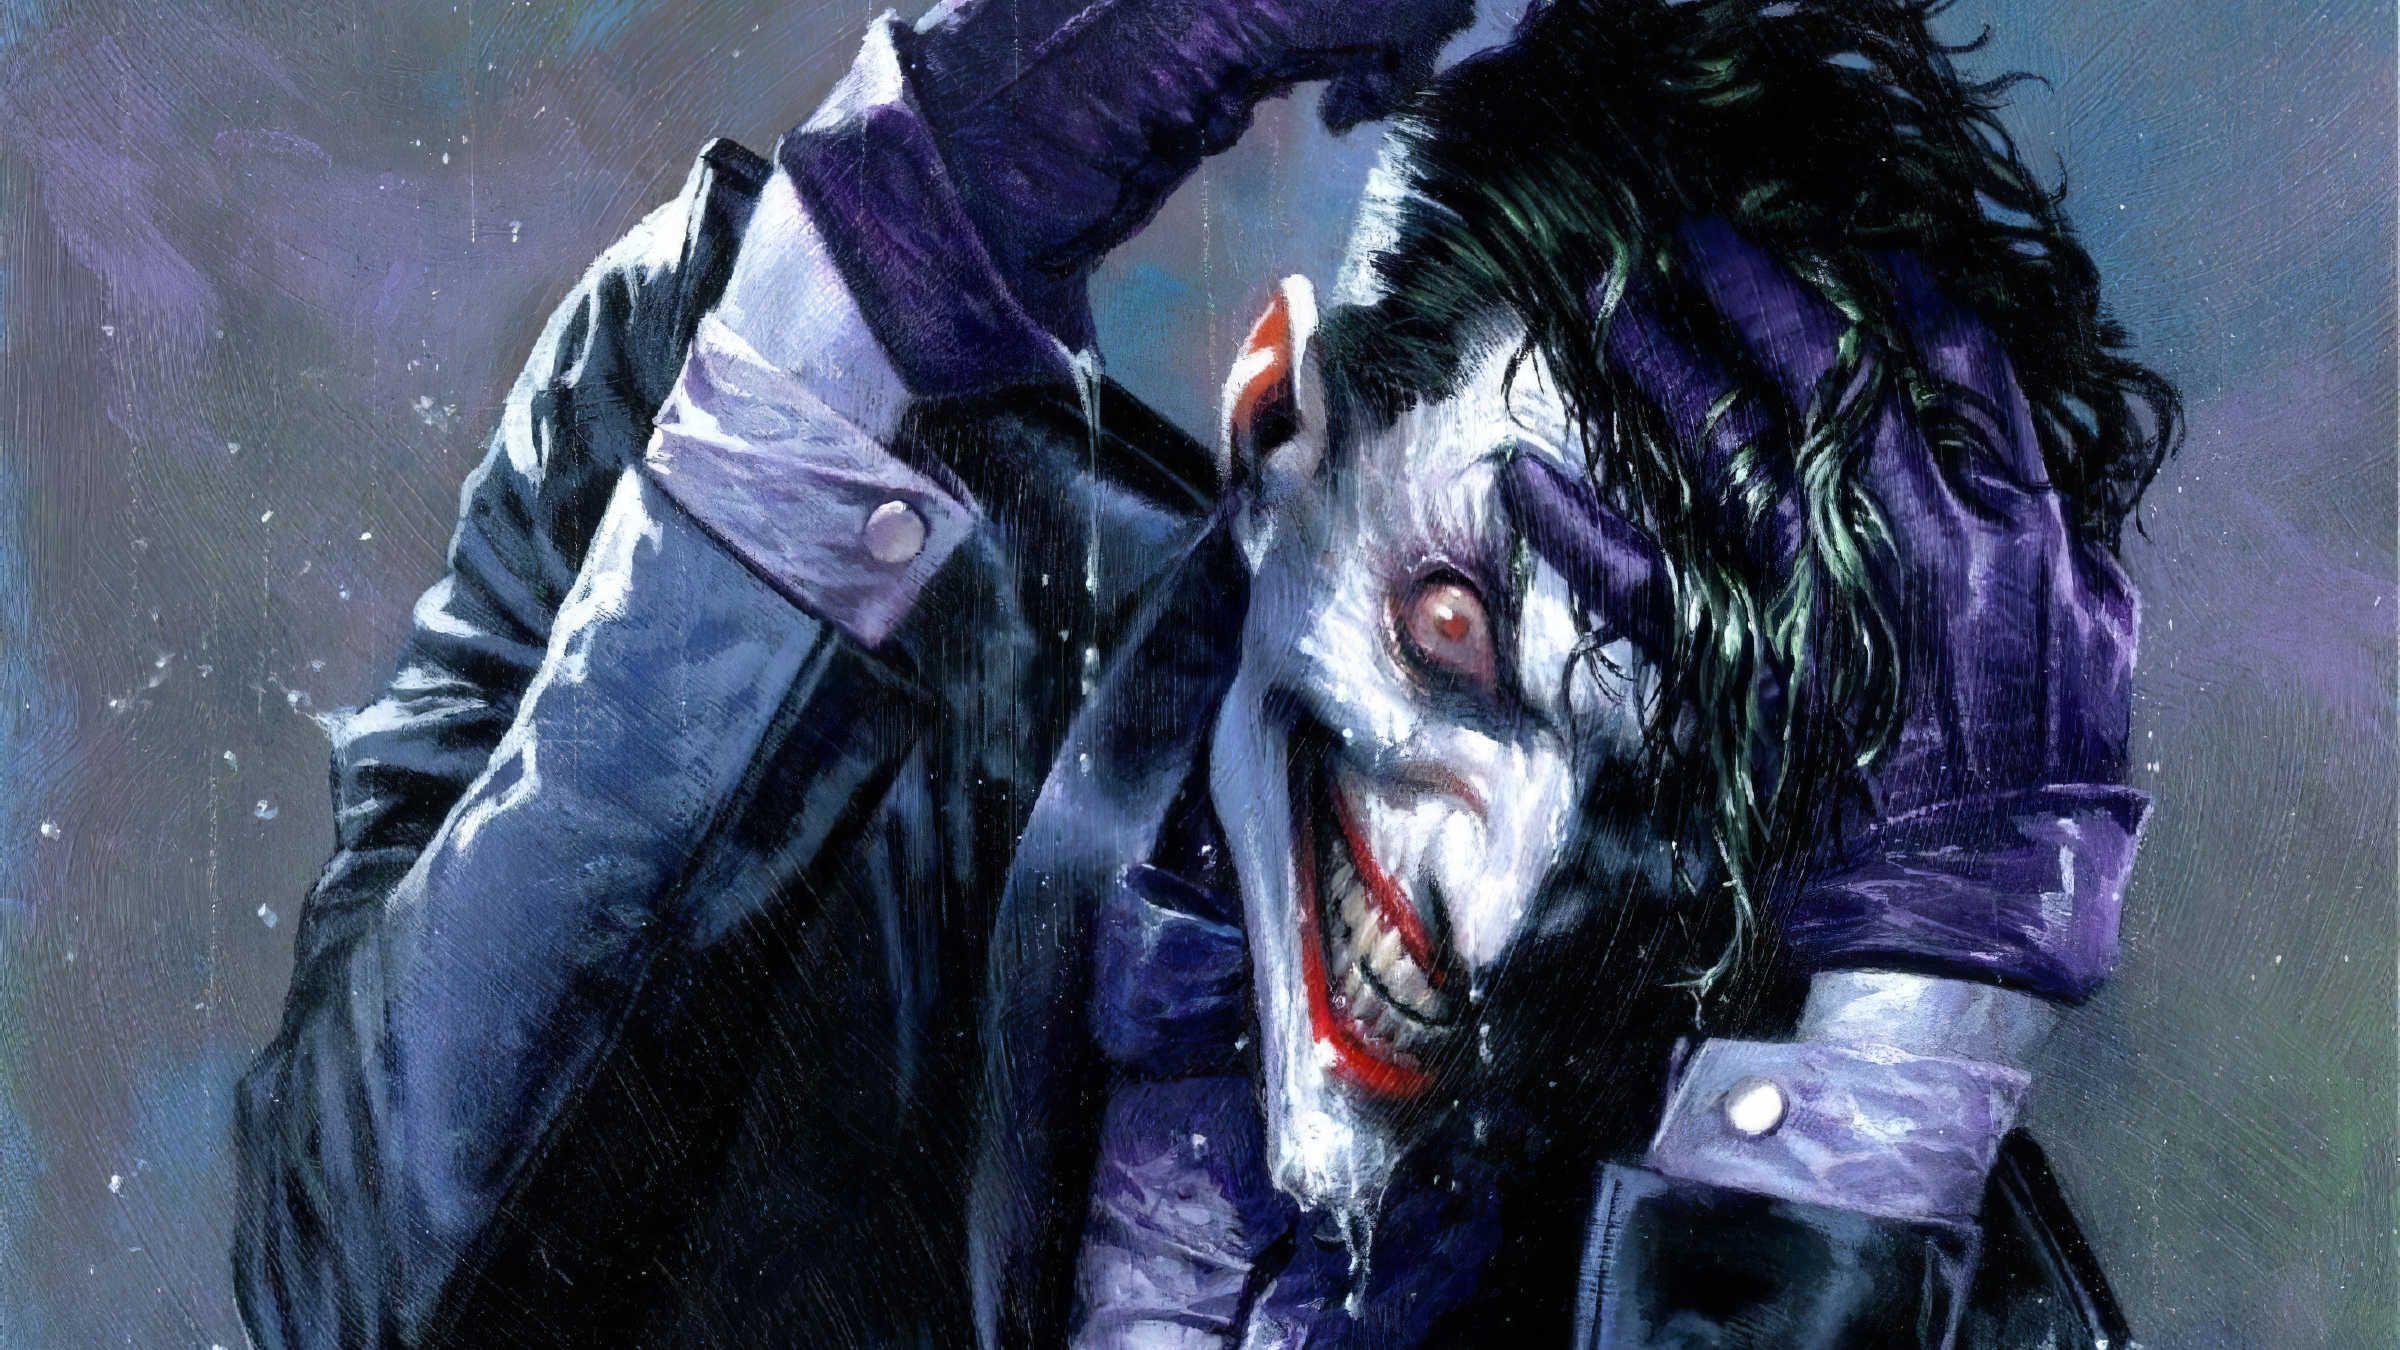 Jared Leto Joker Wallpaper Hd In 2021 Joker Wallpapers Leto Joker Joker Joker 2021 joker wallpaper hd download